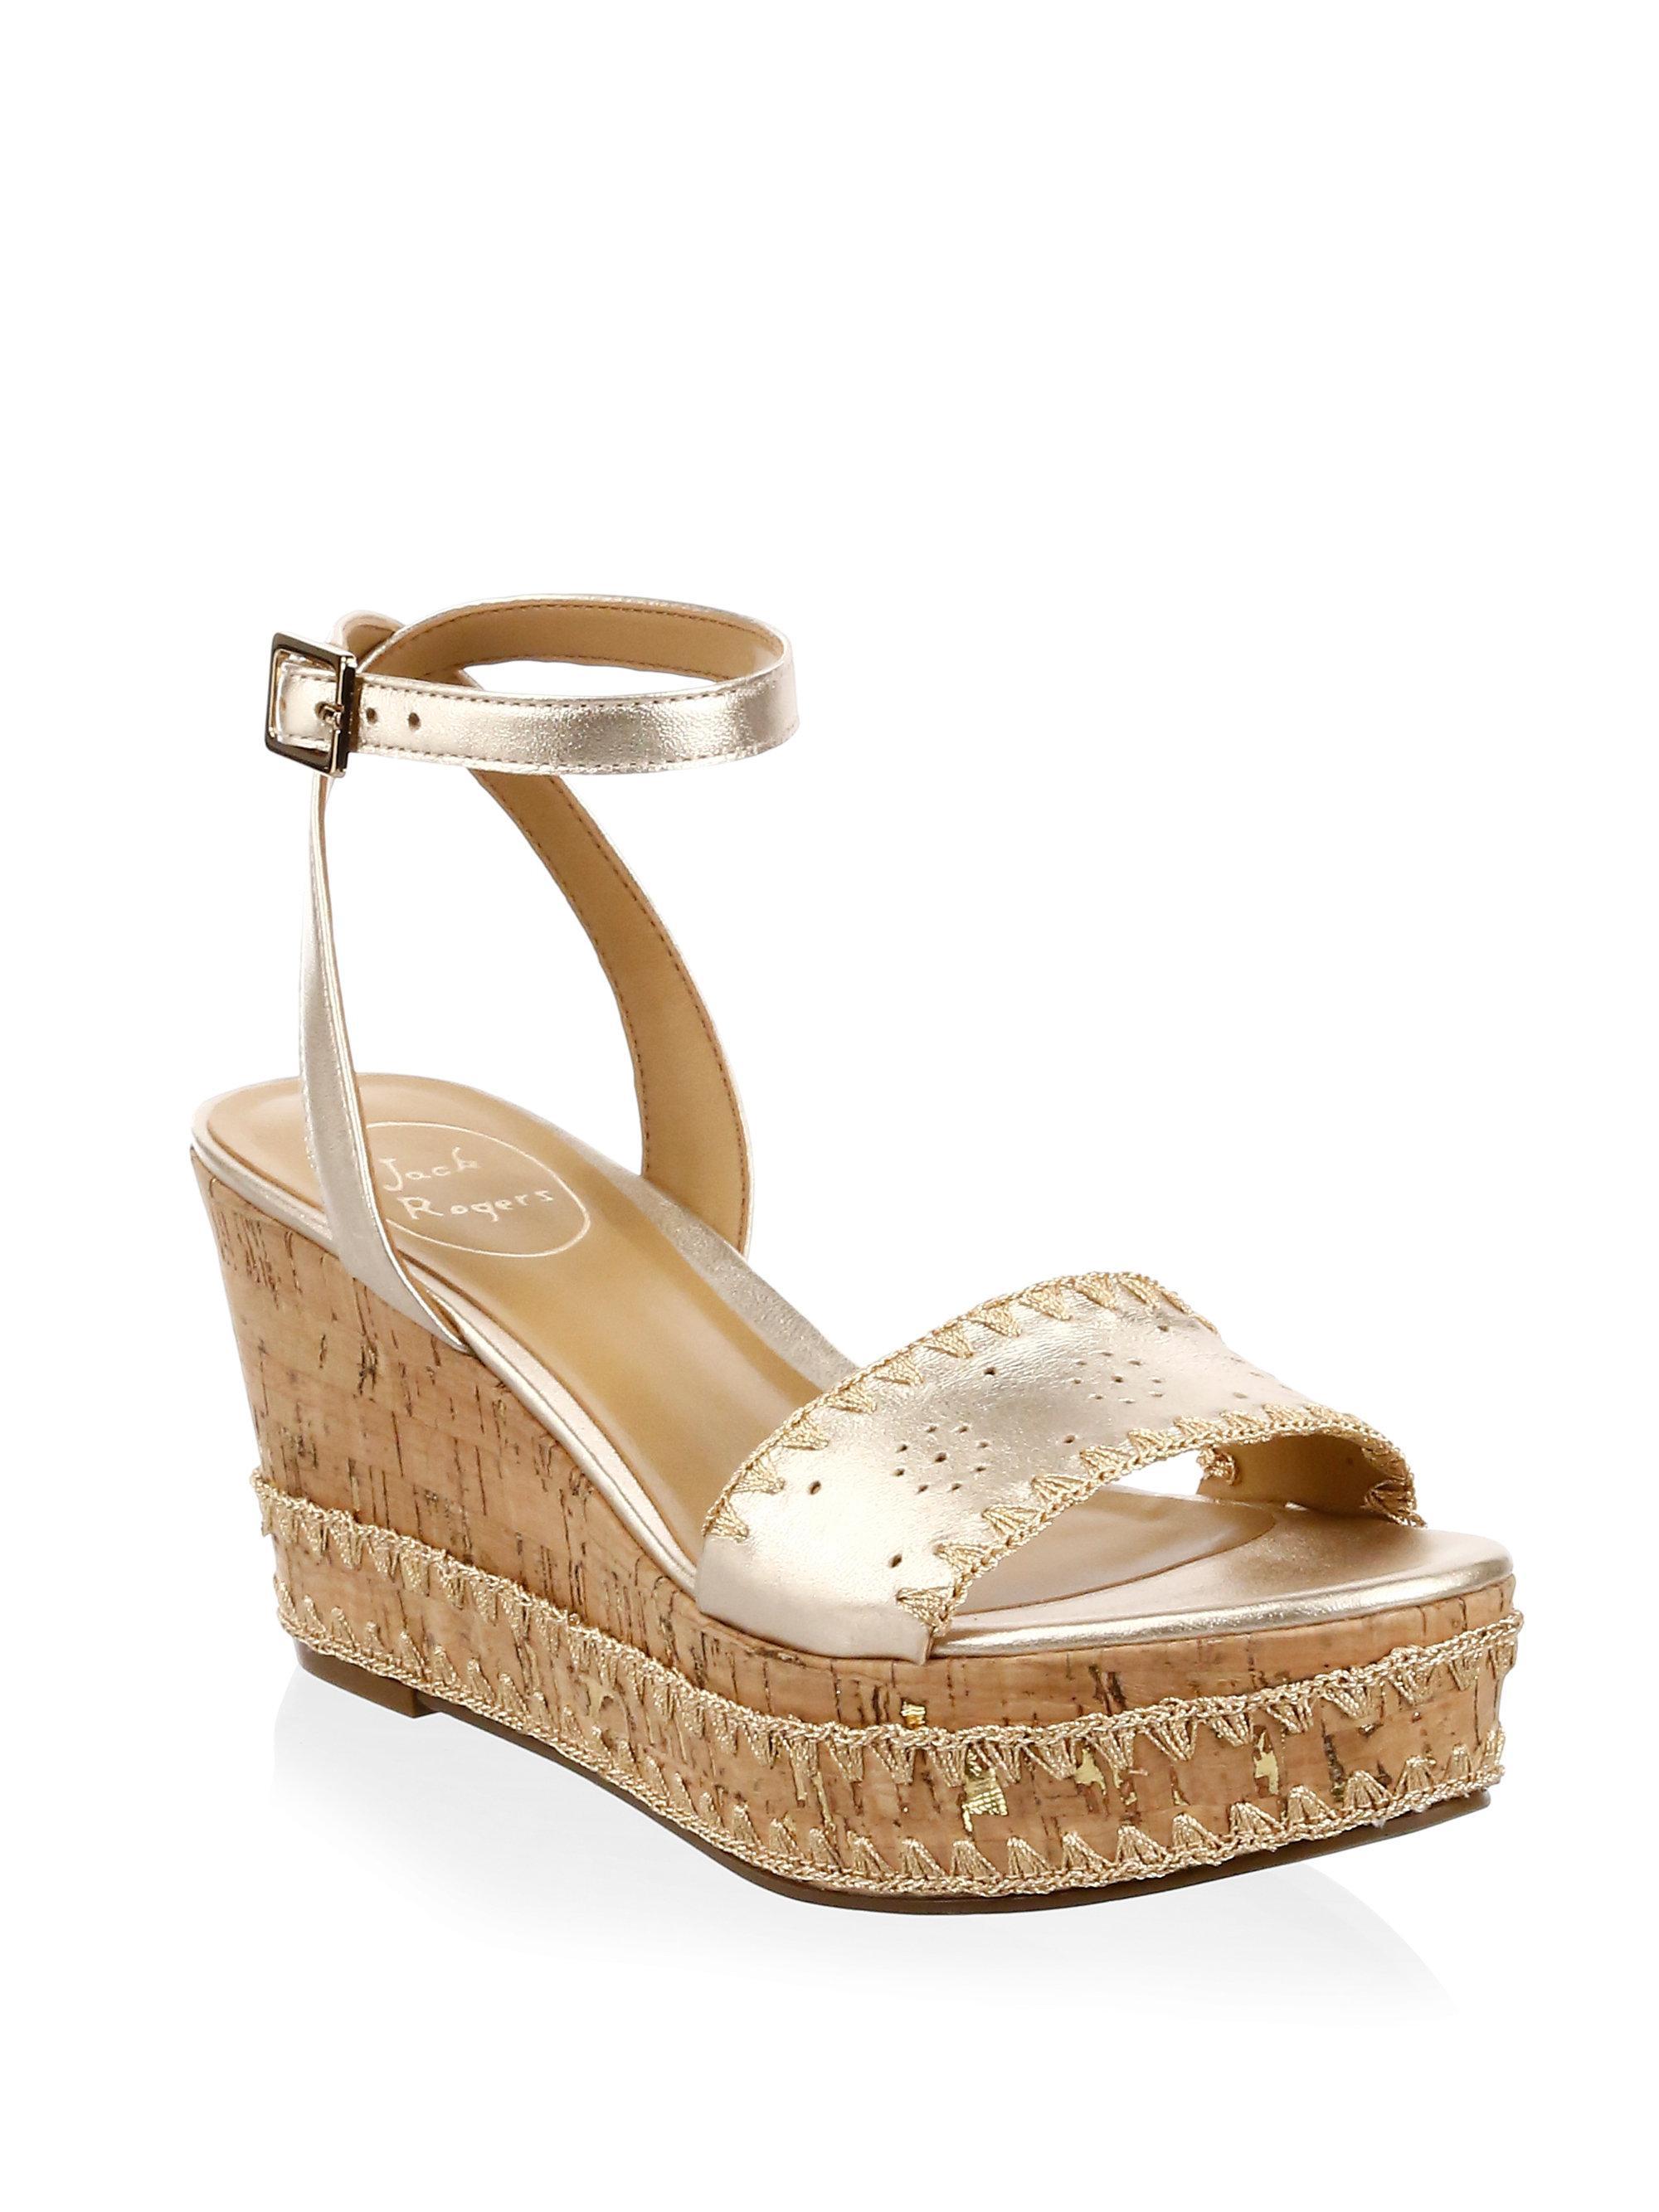 Jack Rogers Women's Lennon Leather & Cork Wedge Platform Sandals